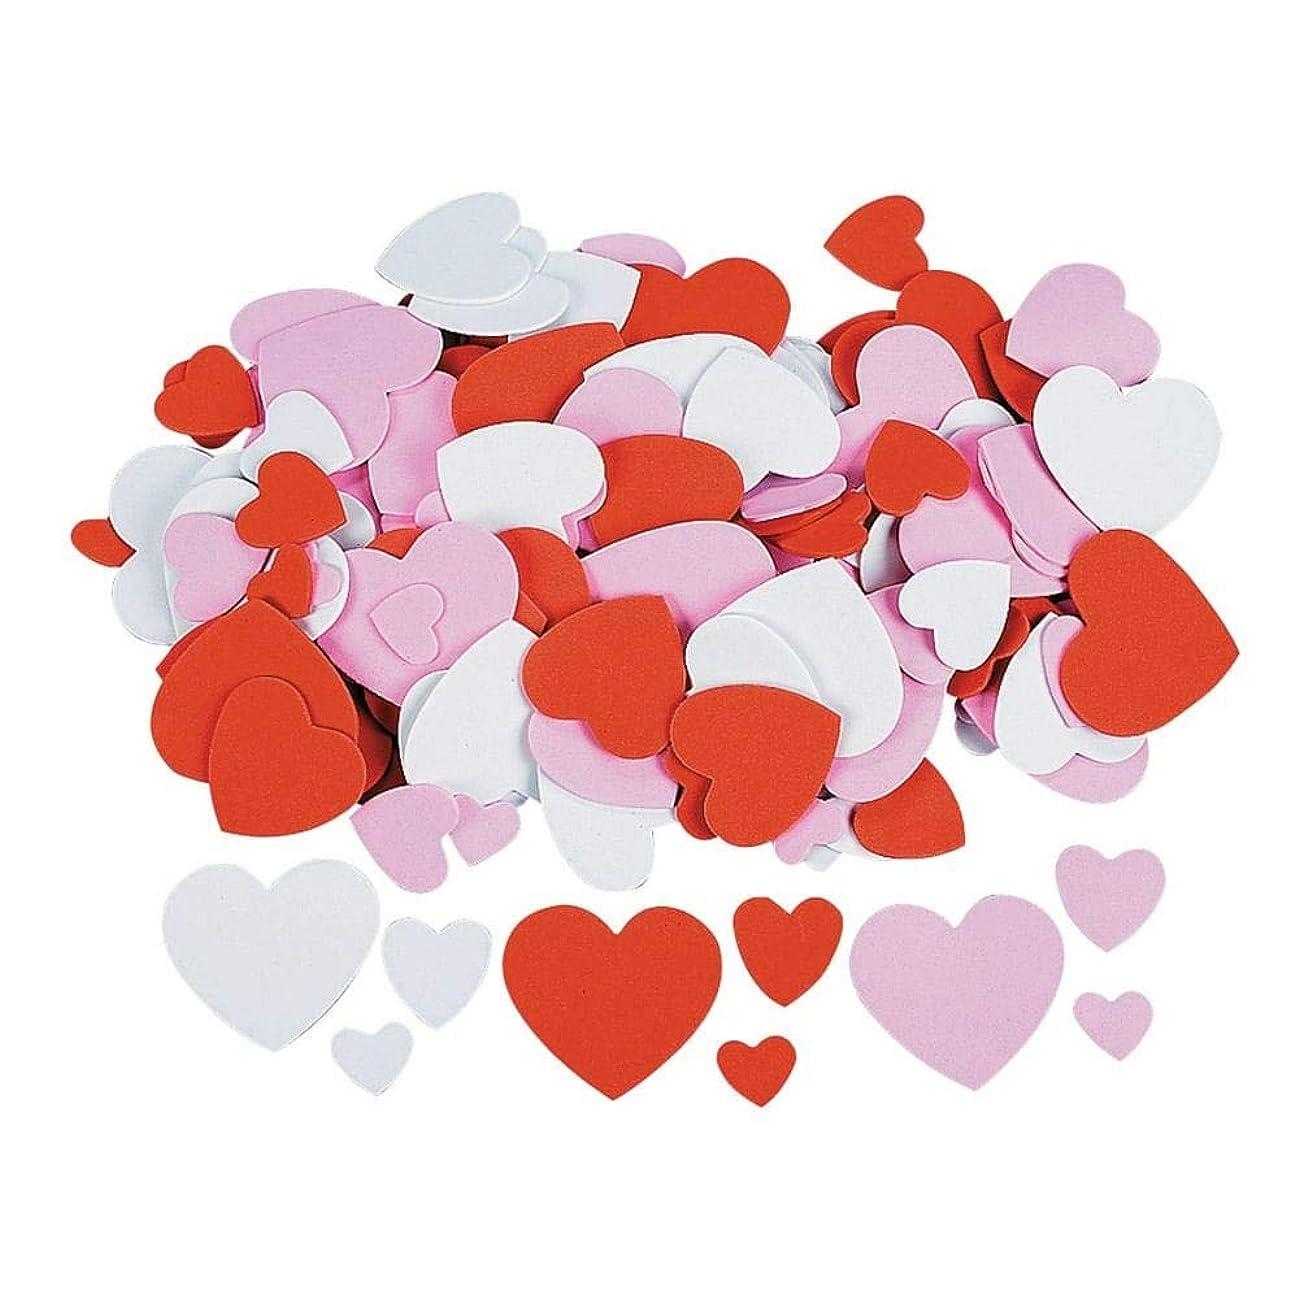 FUN EXPRESS FOAM HEARTS 400 PIECES - ASSORTED